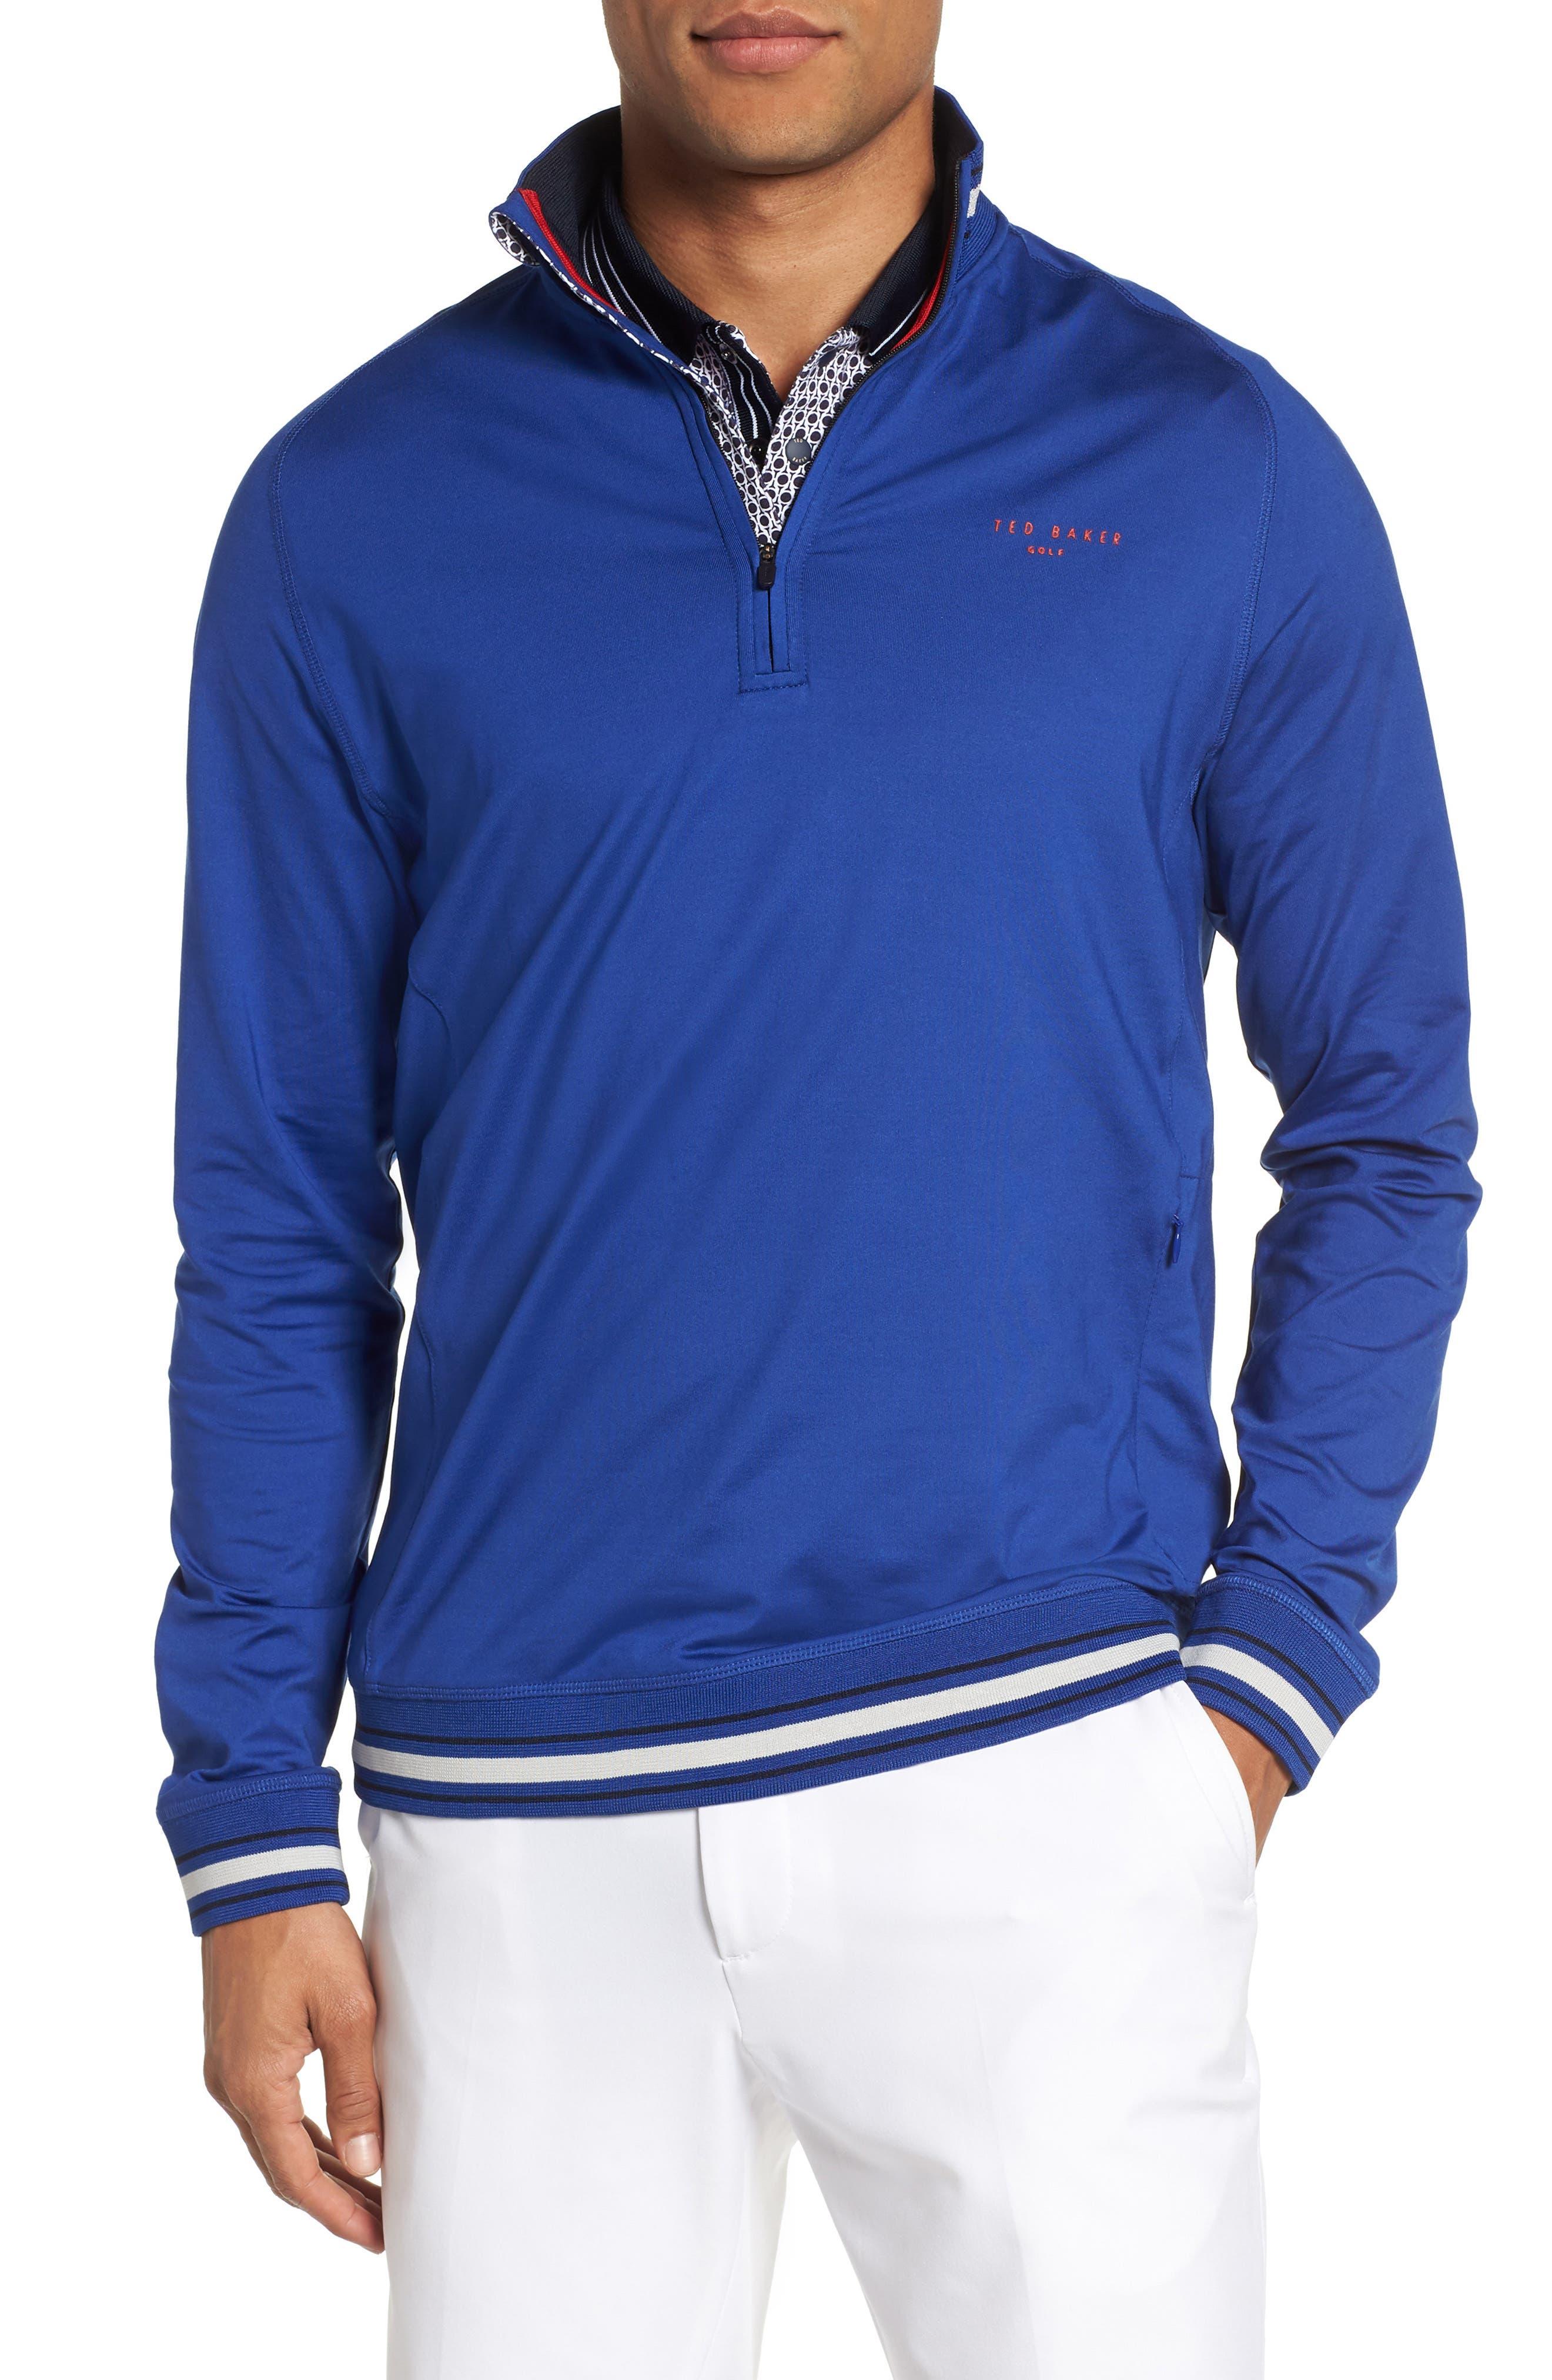 Ted Baker London Trim Fit Quarter Zip Golf Pullover